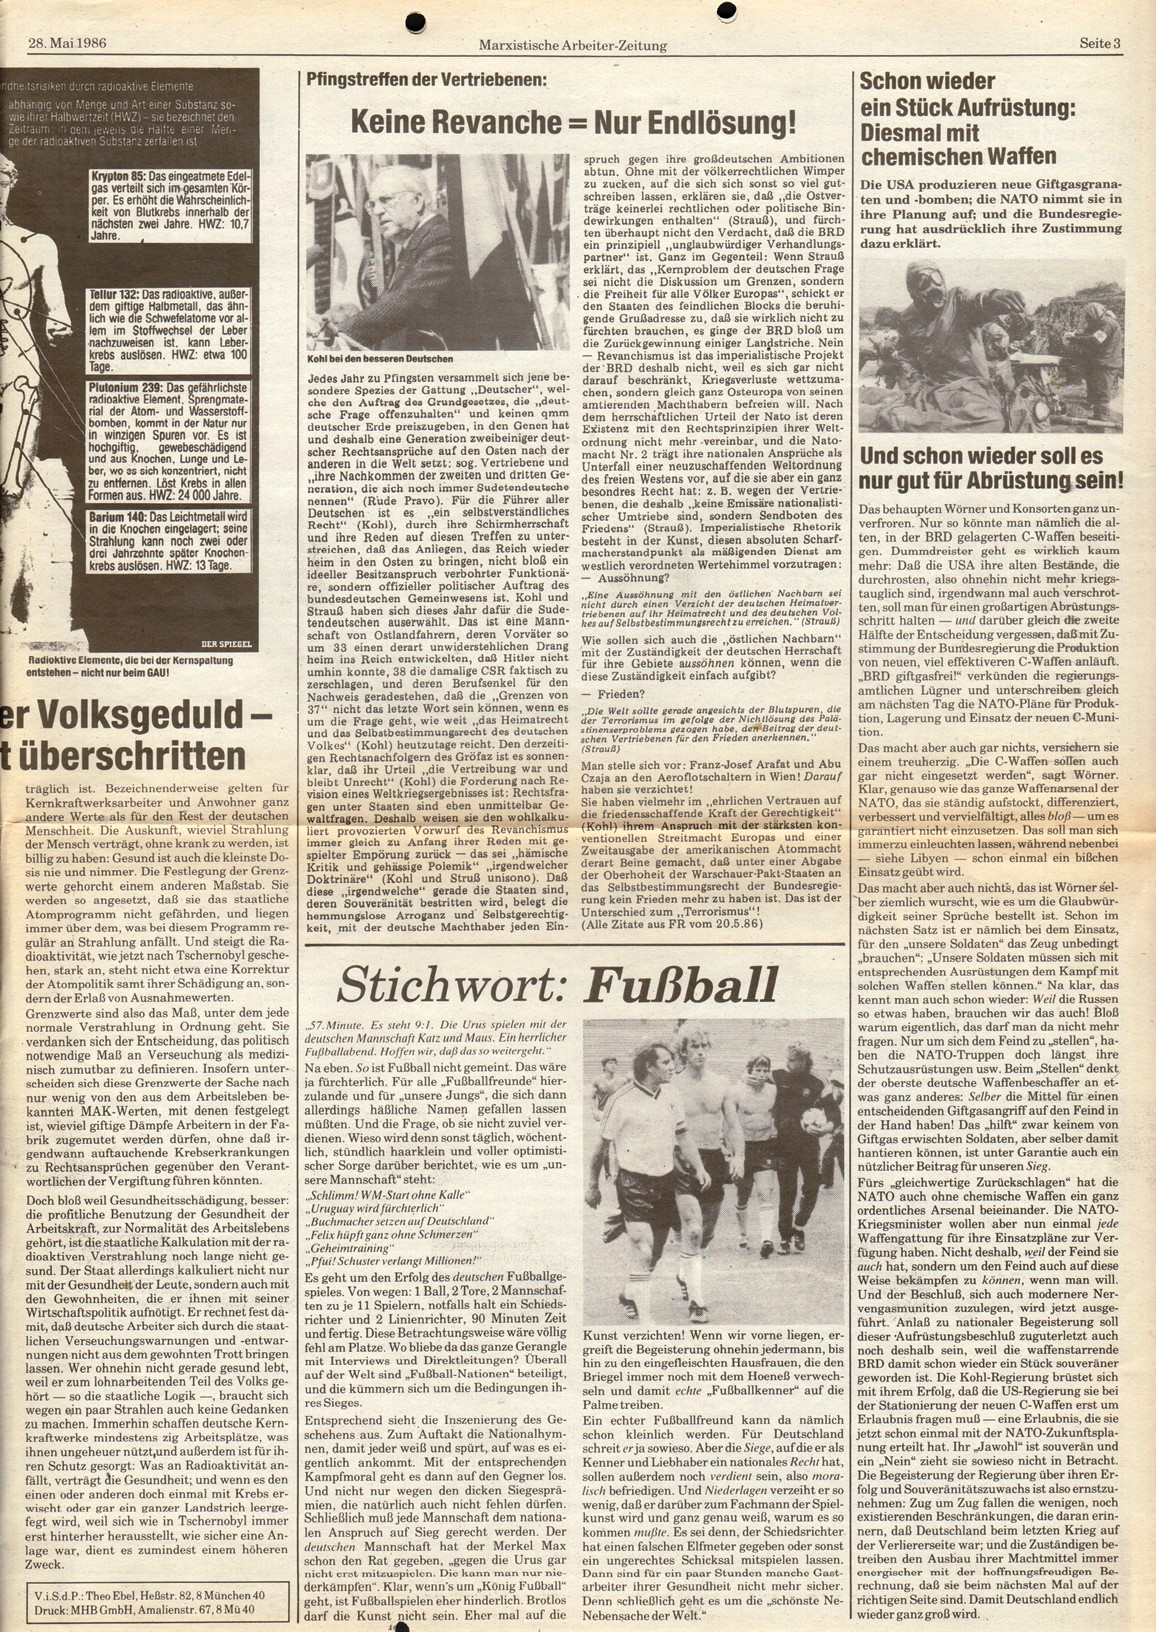 Muenchen_MG_MAZ_Krauss_Maffei_19860528_03